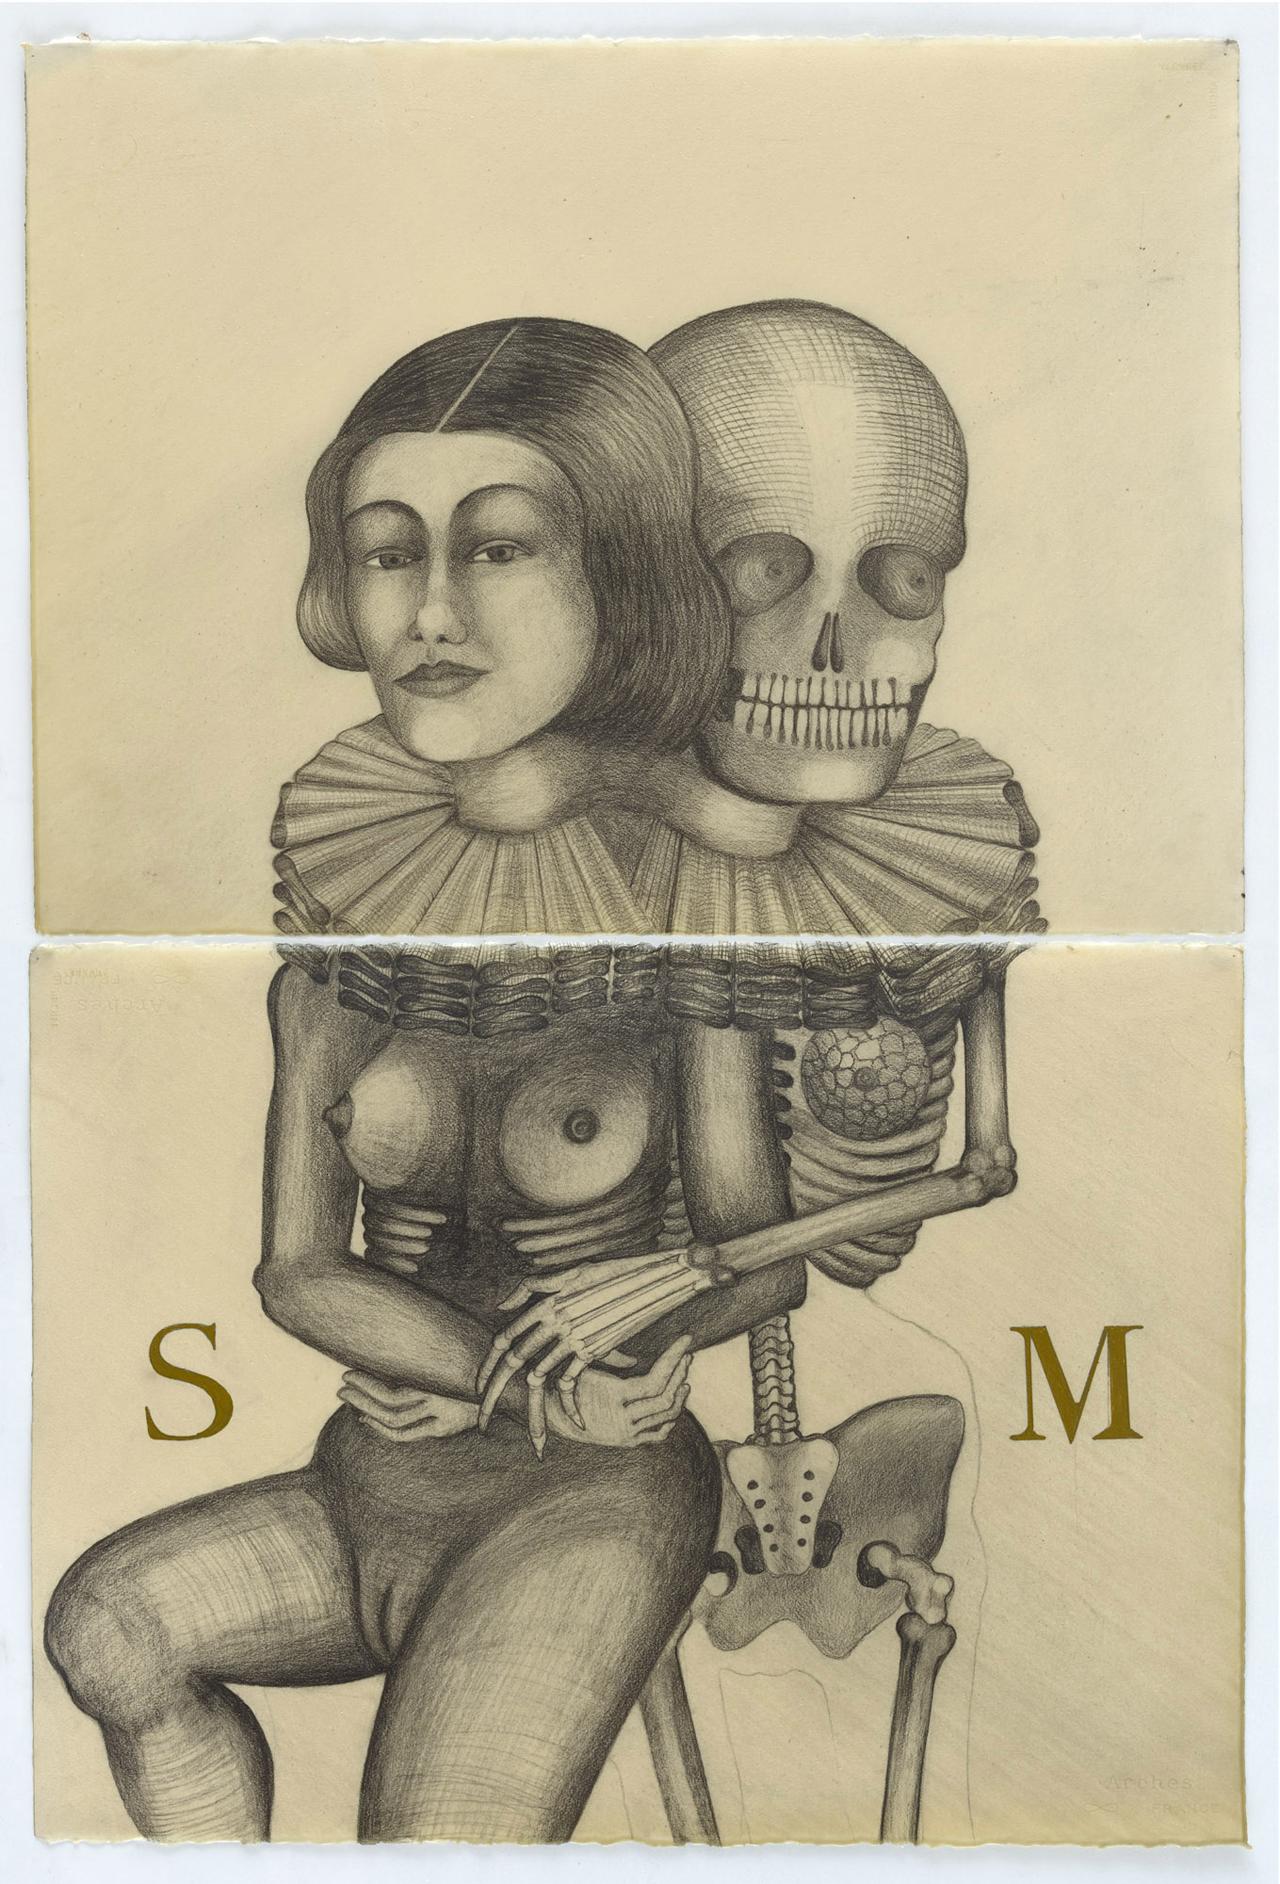 Sandra Vásquez de la Horra, Santa Muerte Hidalga, 2016, Bleistift und Pigment auf Aquarellkarton in Wachs, zweiteilig mit Rahmen: 121,2 x 84,2 x 5,0 cm